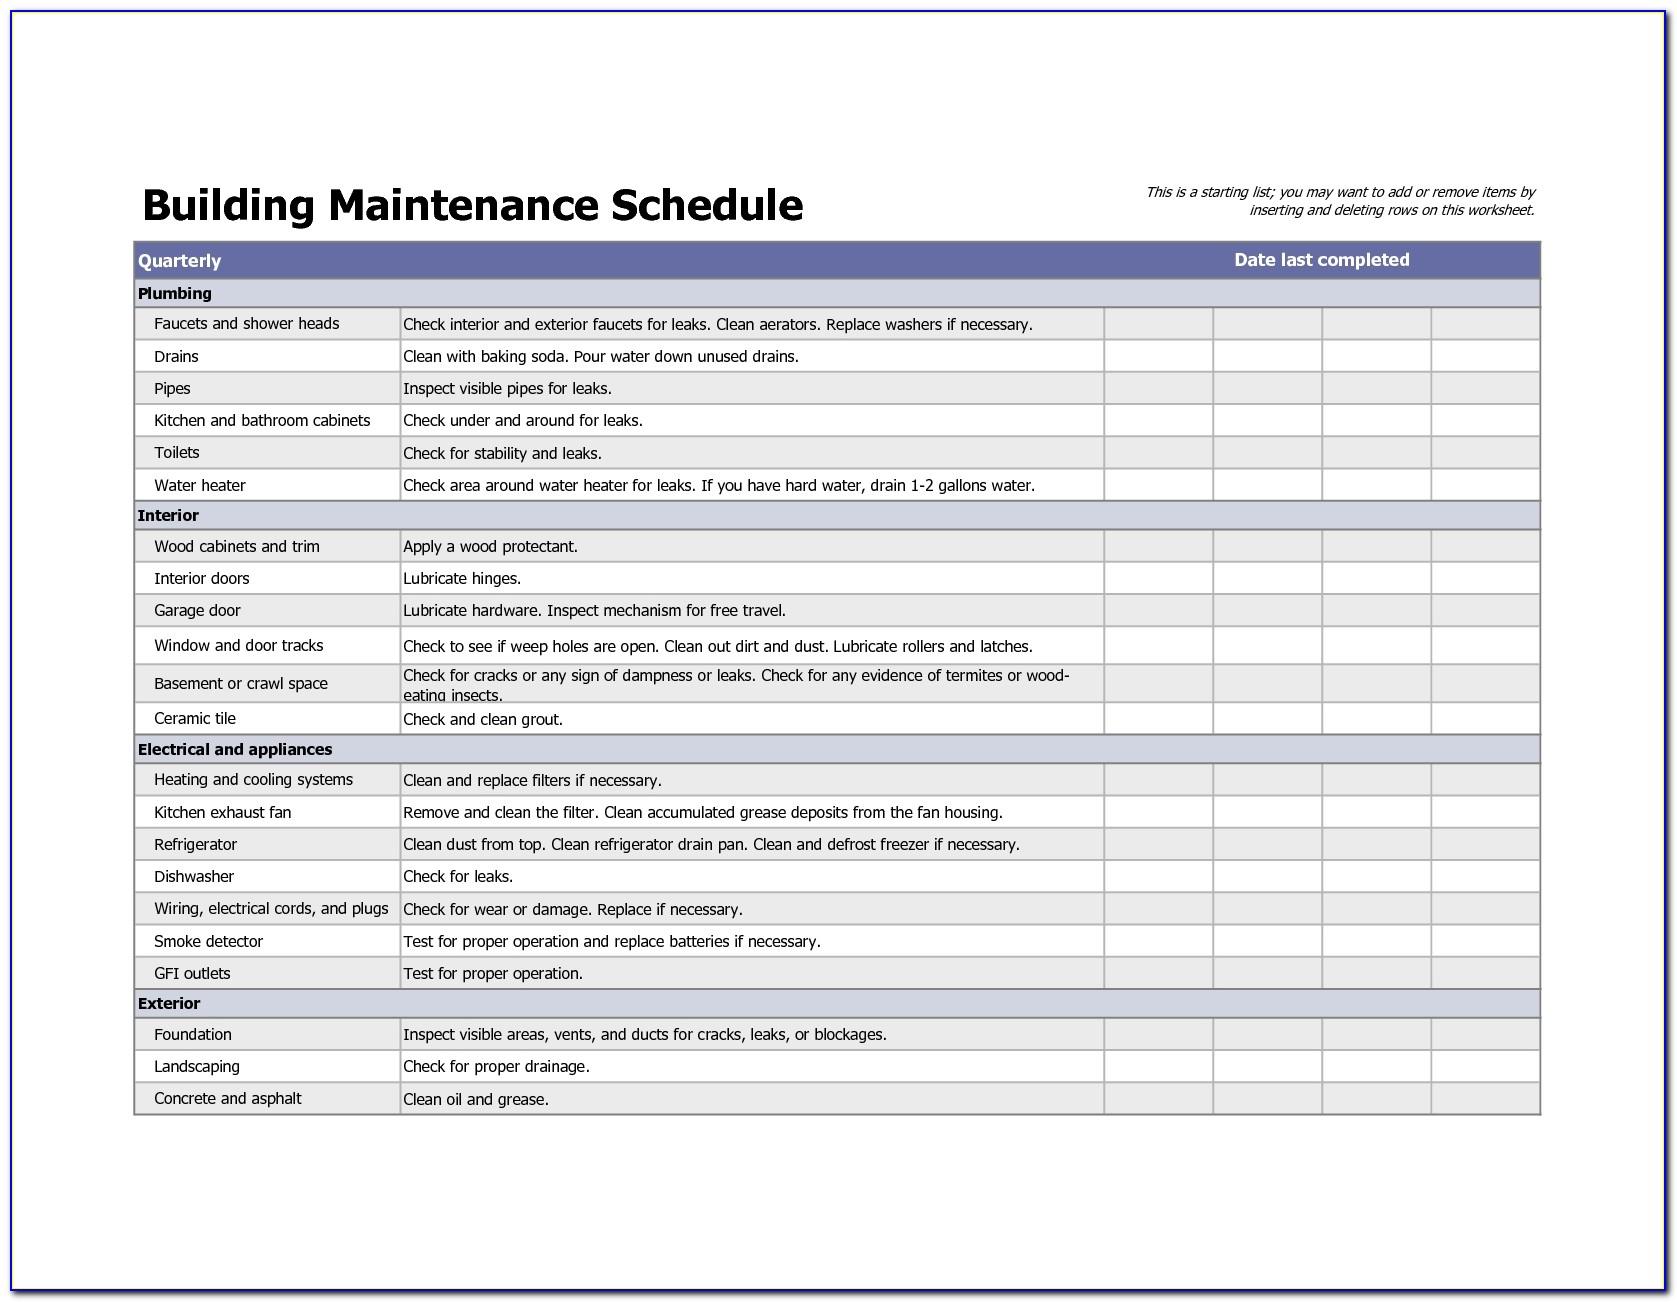 Building Maintenance Schedule Excel Template | Home Maintenance With Home Maintenance Spreadsheet